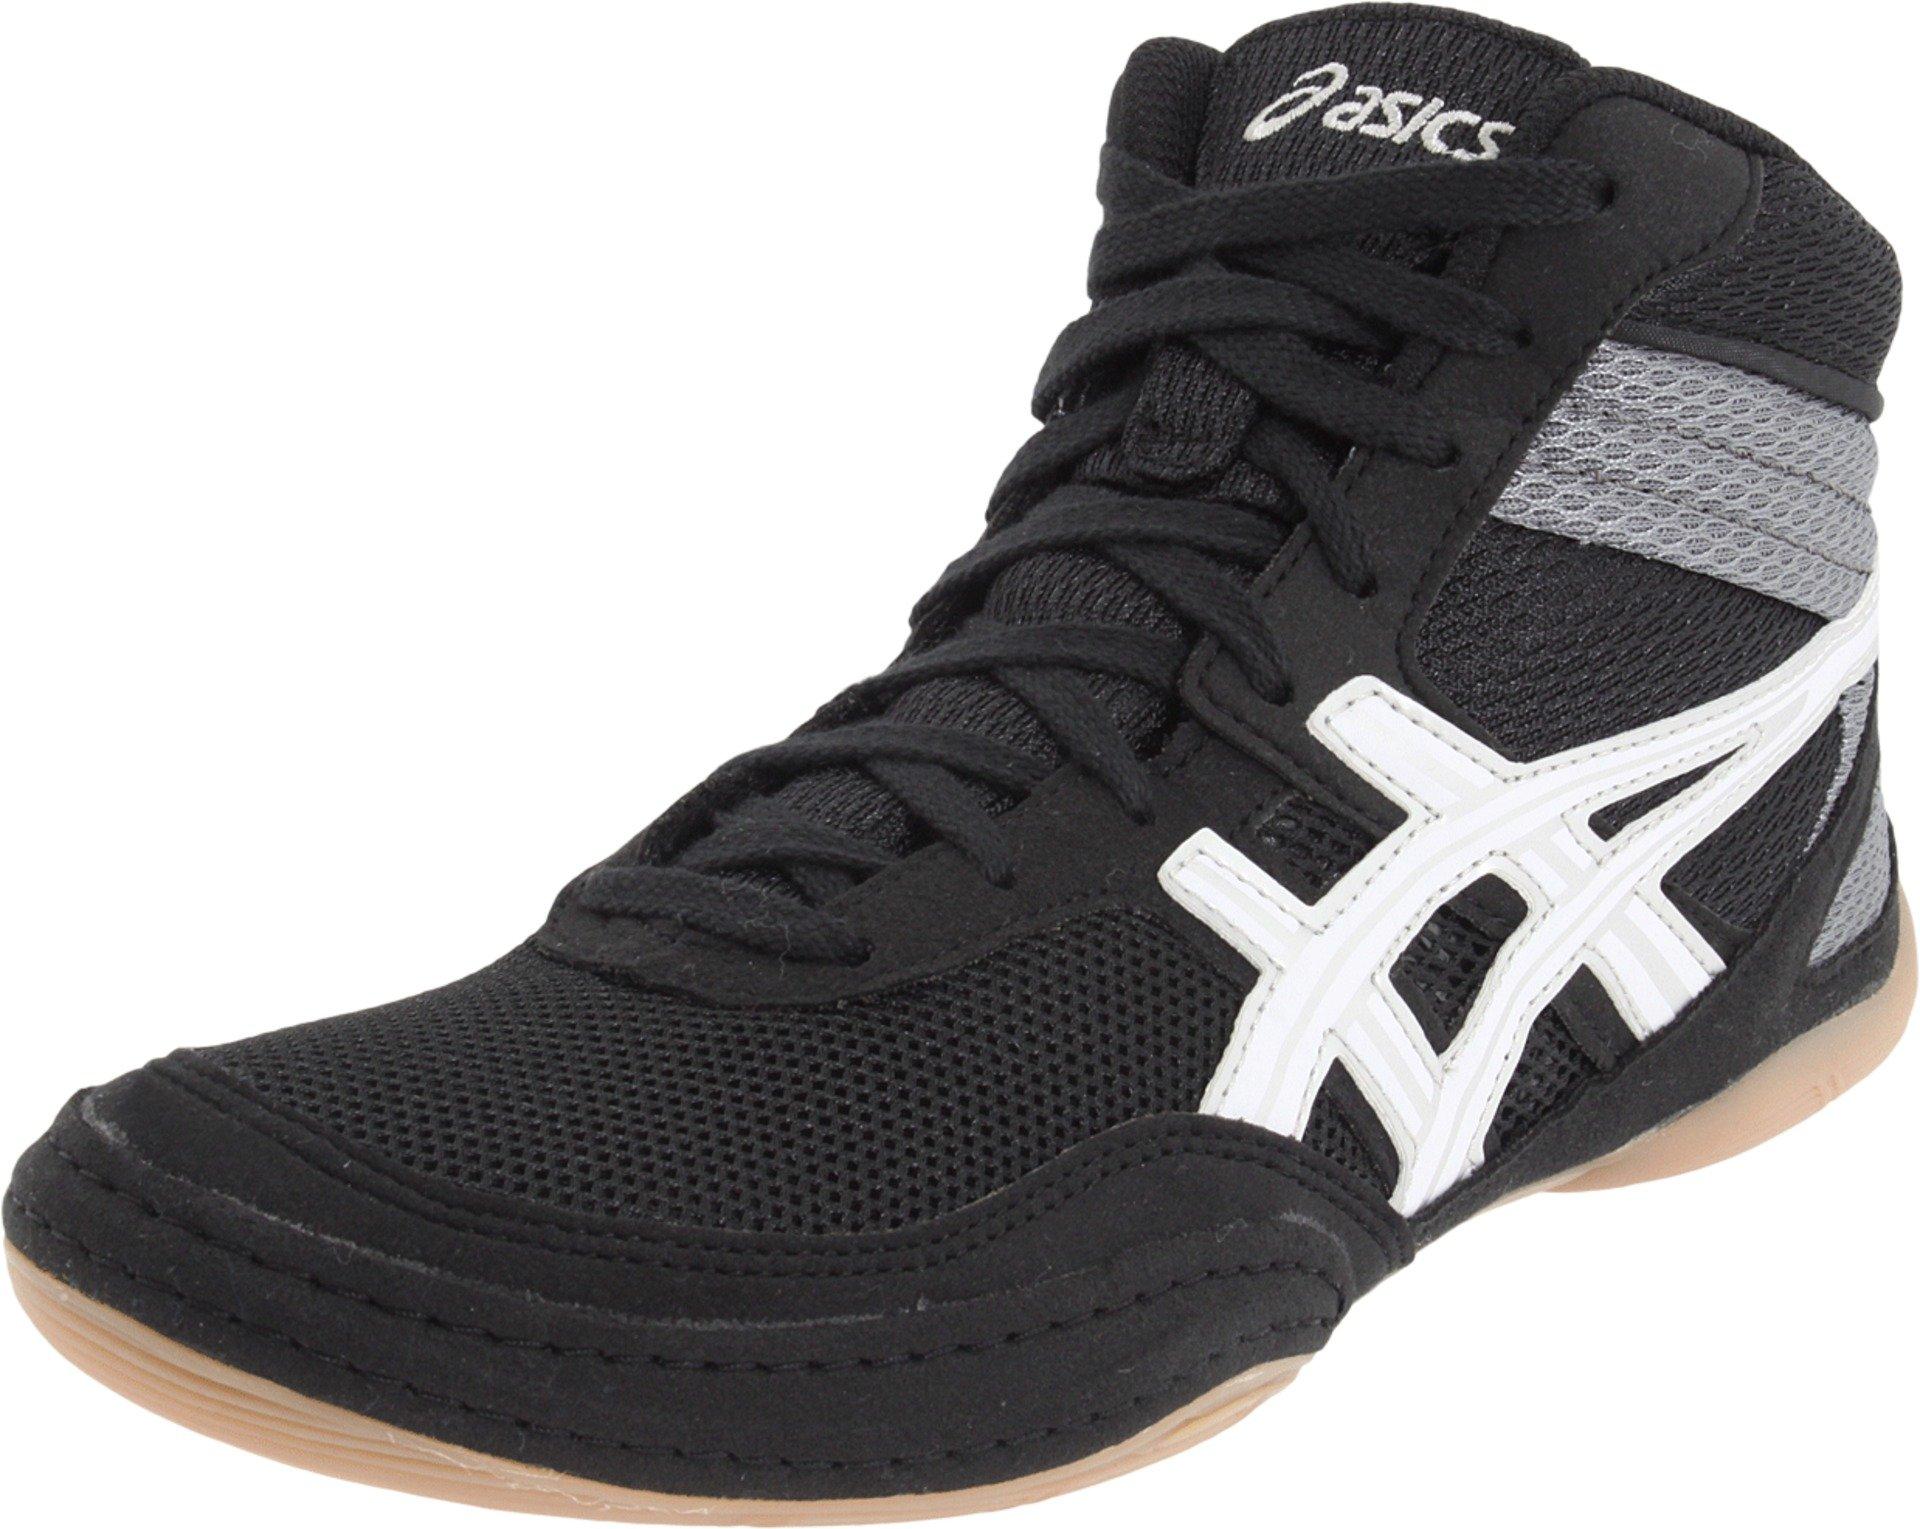 ASICS Men's Matflex 3 Wrestling Shoe,Black/White,9.5 M US